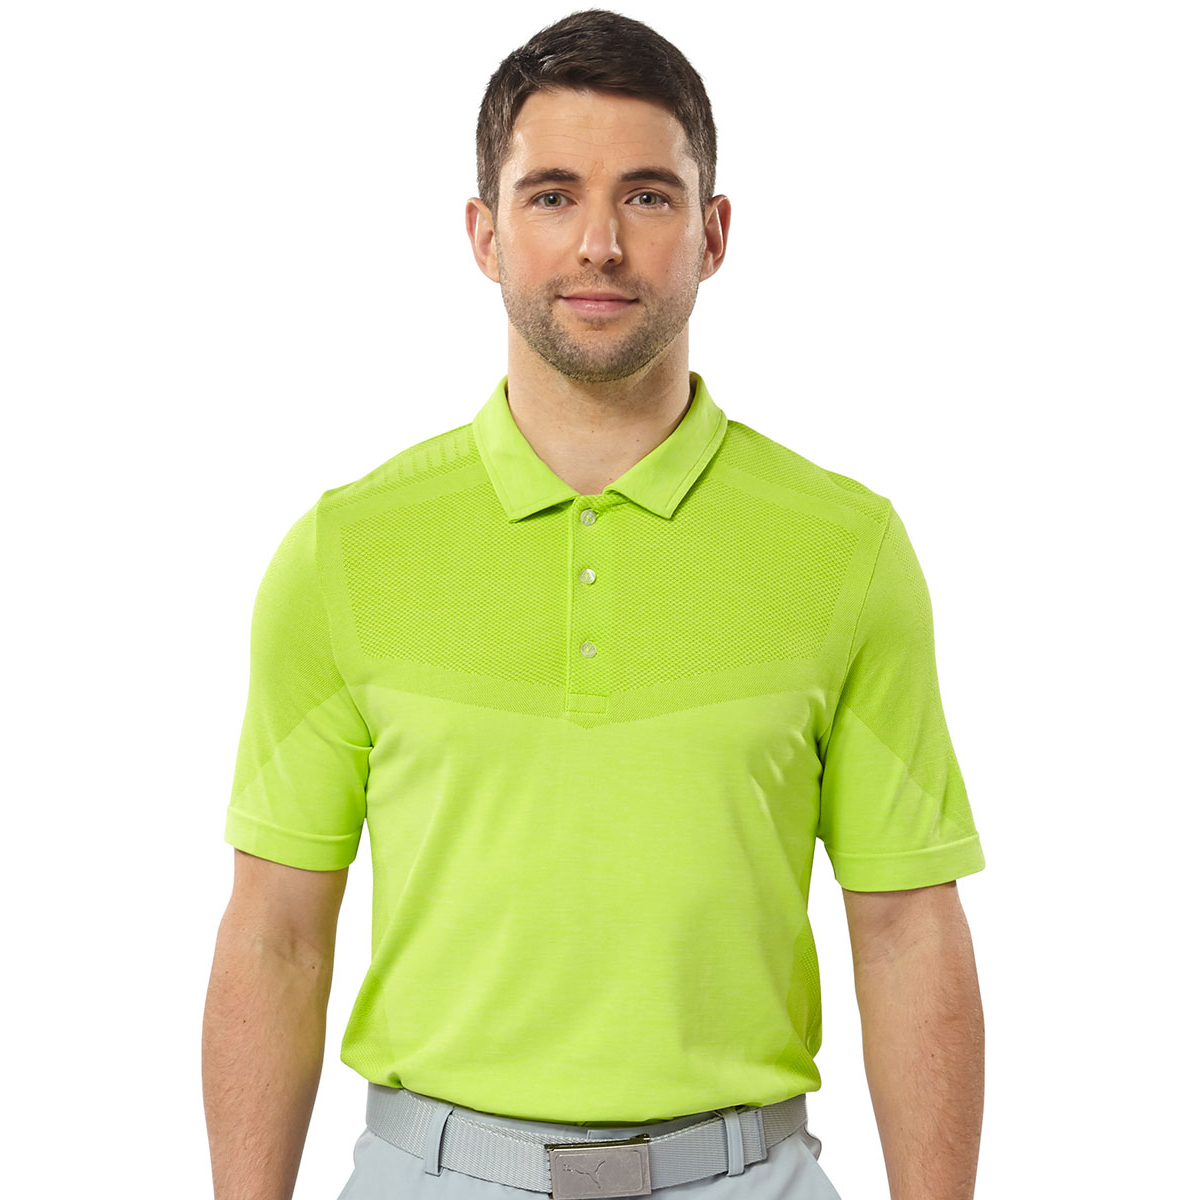 9a64e7b3ab4a PUMA Golf EVOKNIT Seamless Polo Shirt 2018